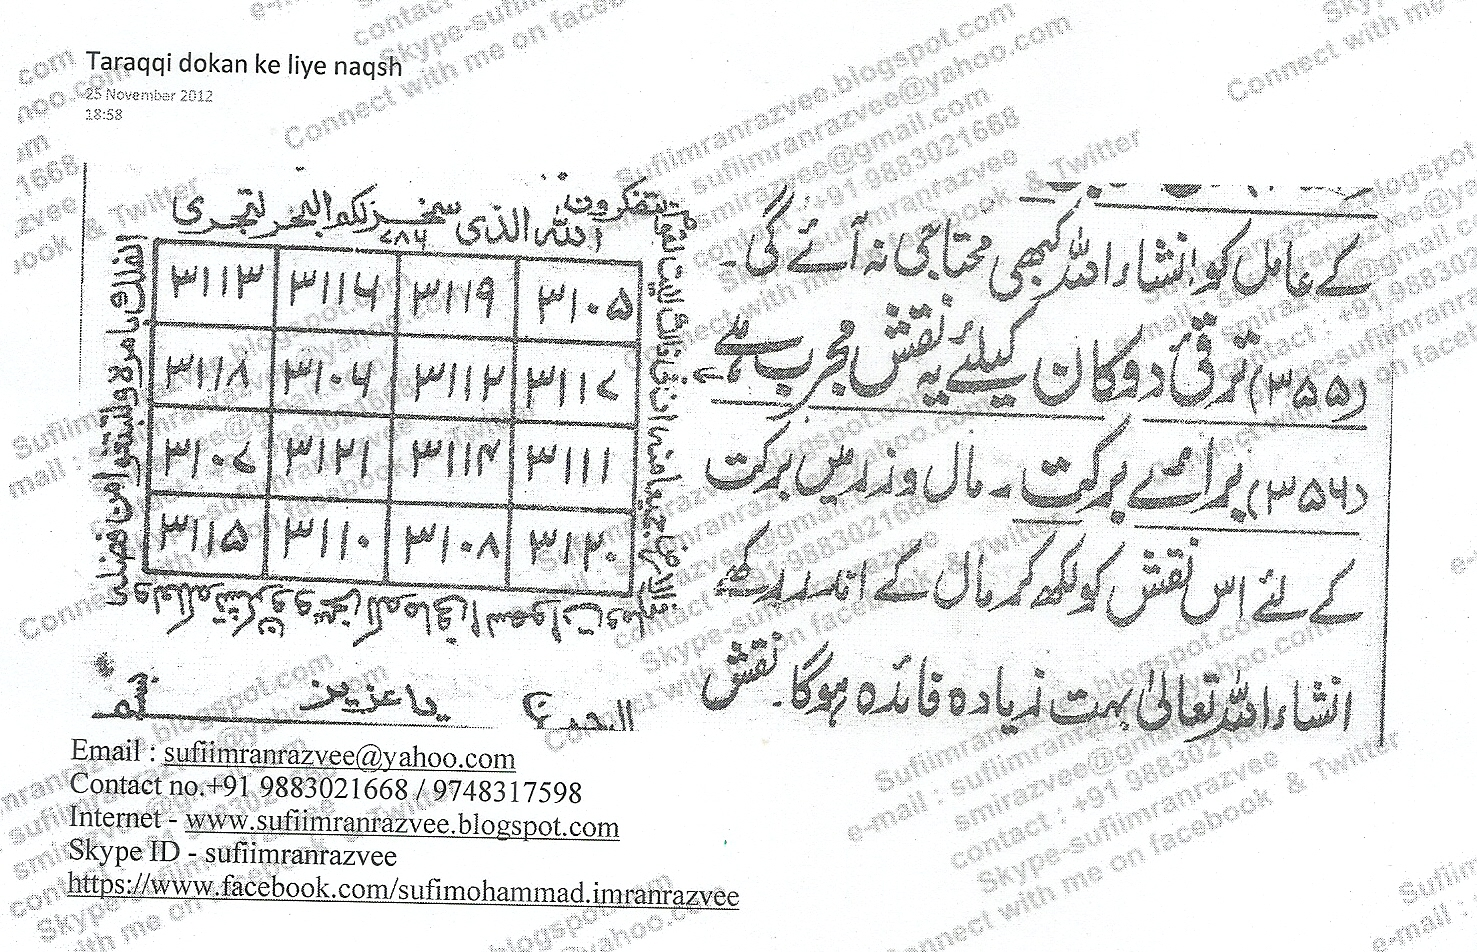 madina arabic book 2 pdf archive.org